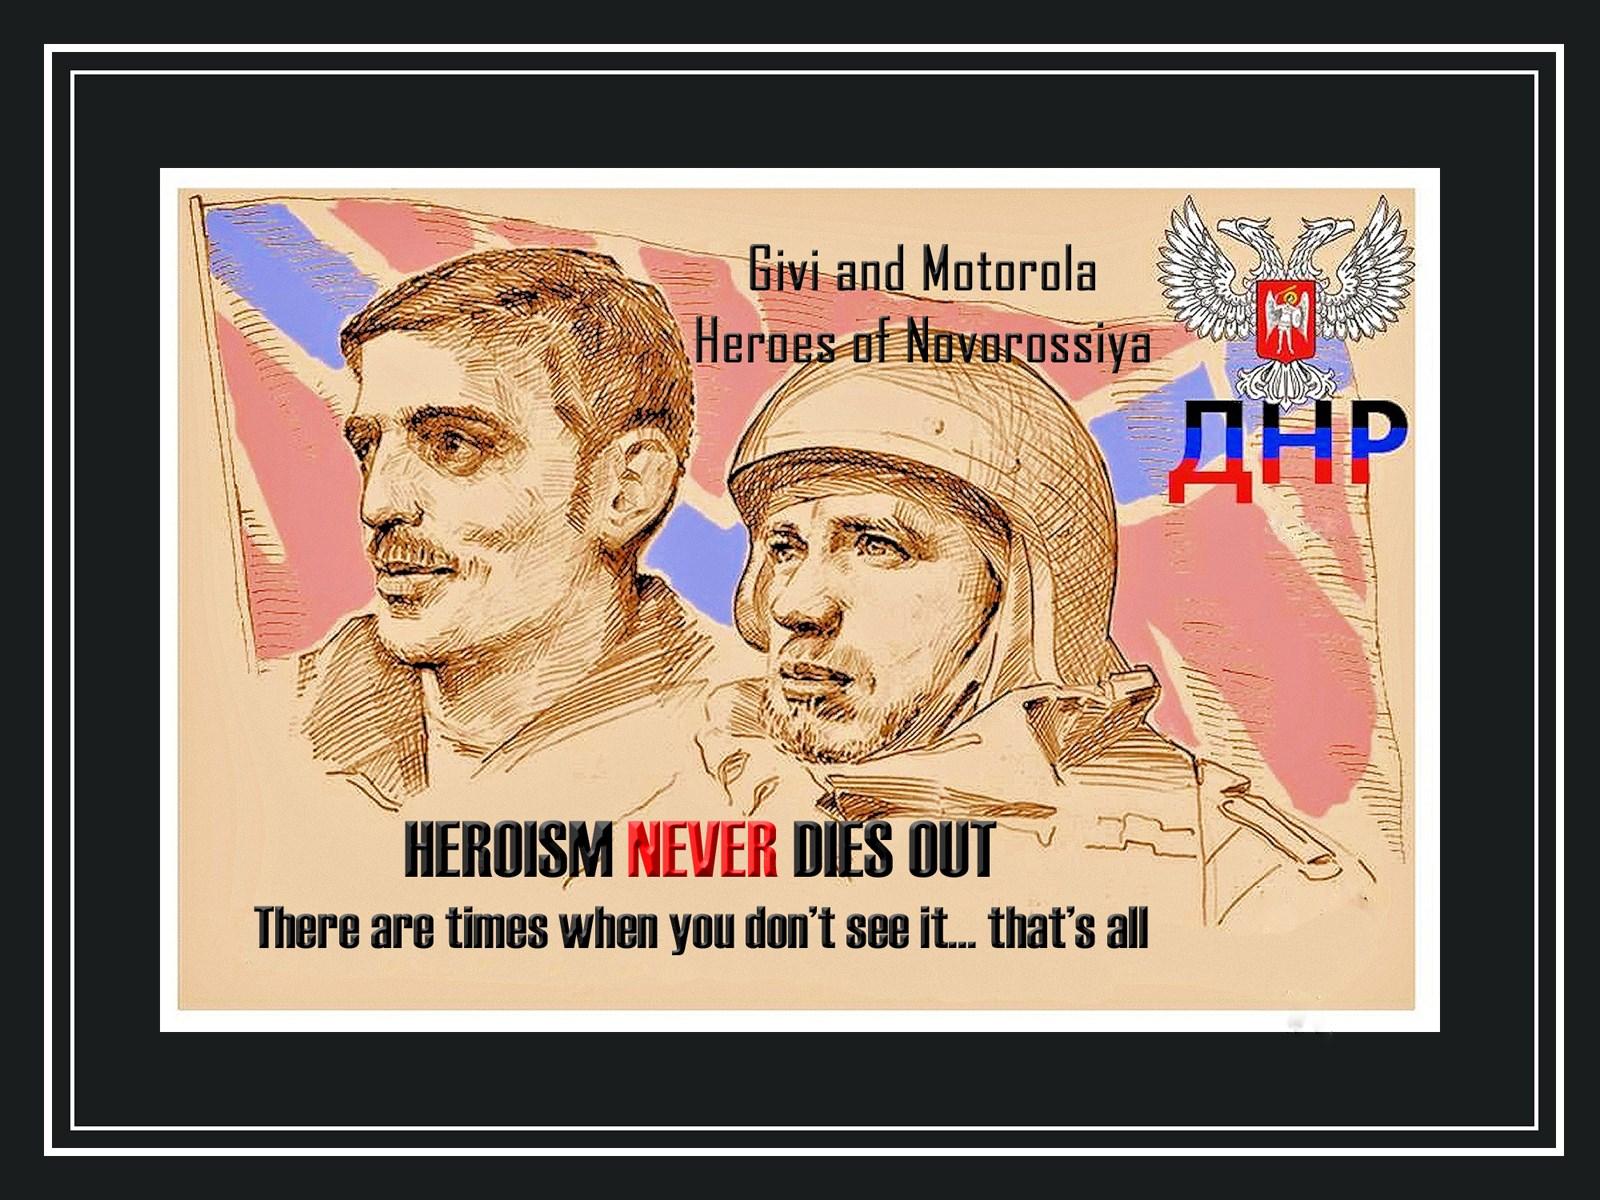 00 heroism motorola and givi. 06.06.15